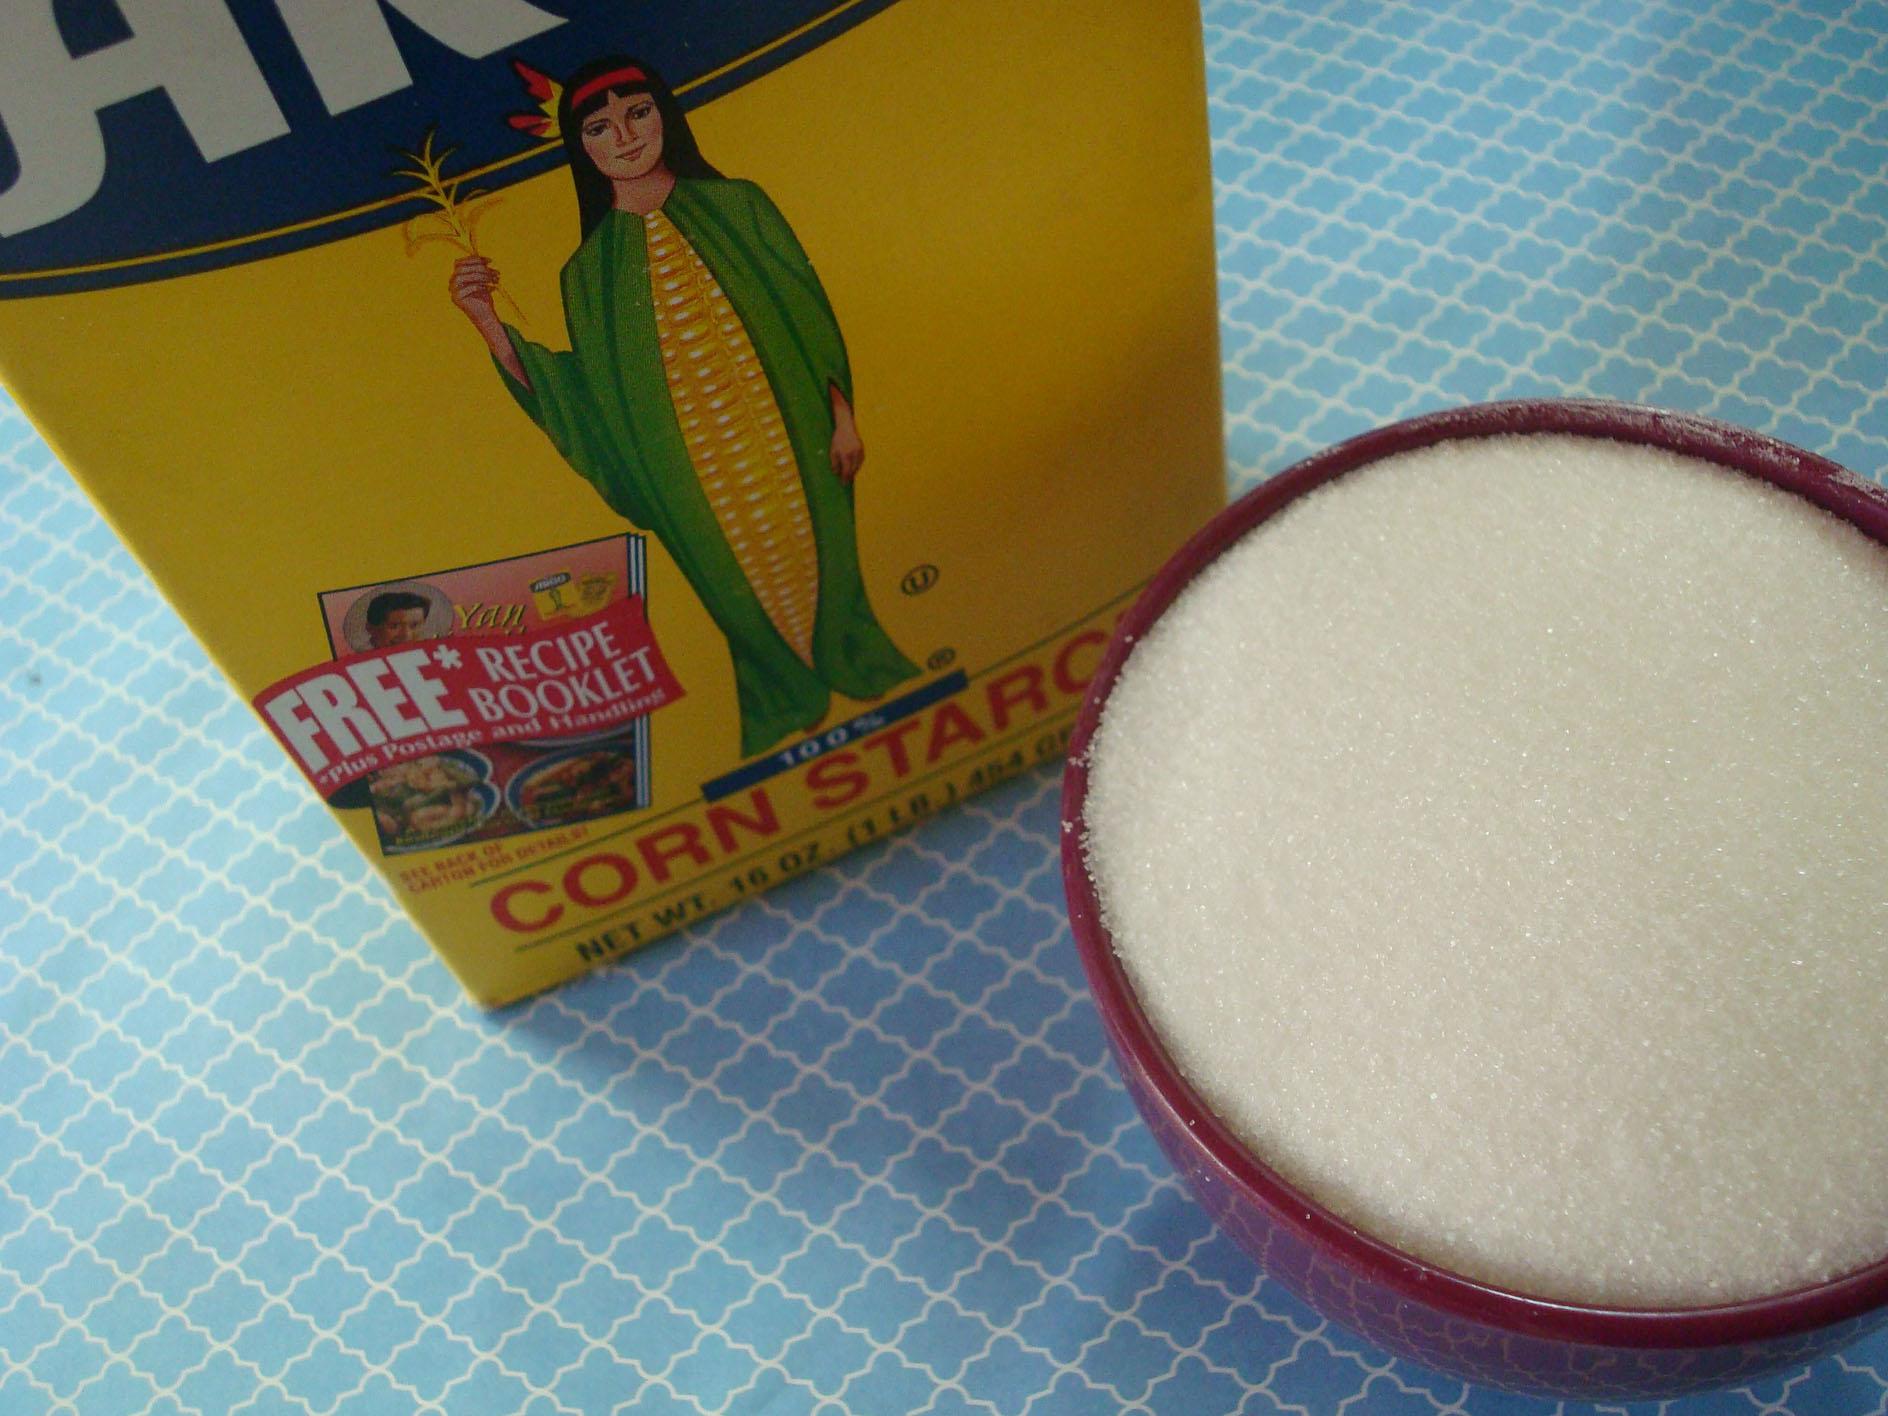 Corn Starch for Making Confectioners' Sugar